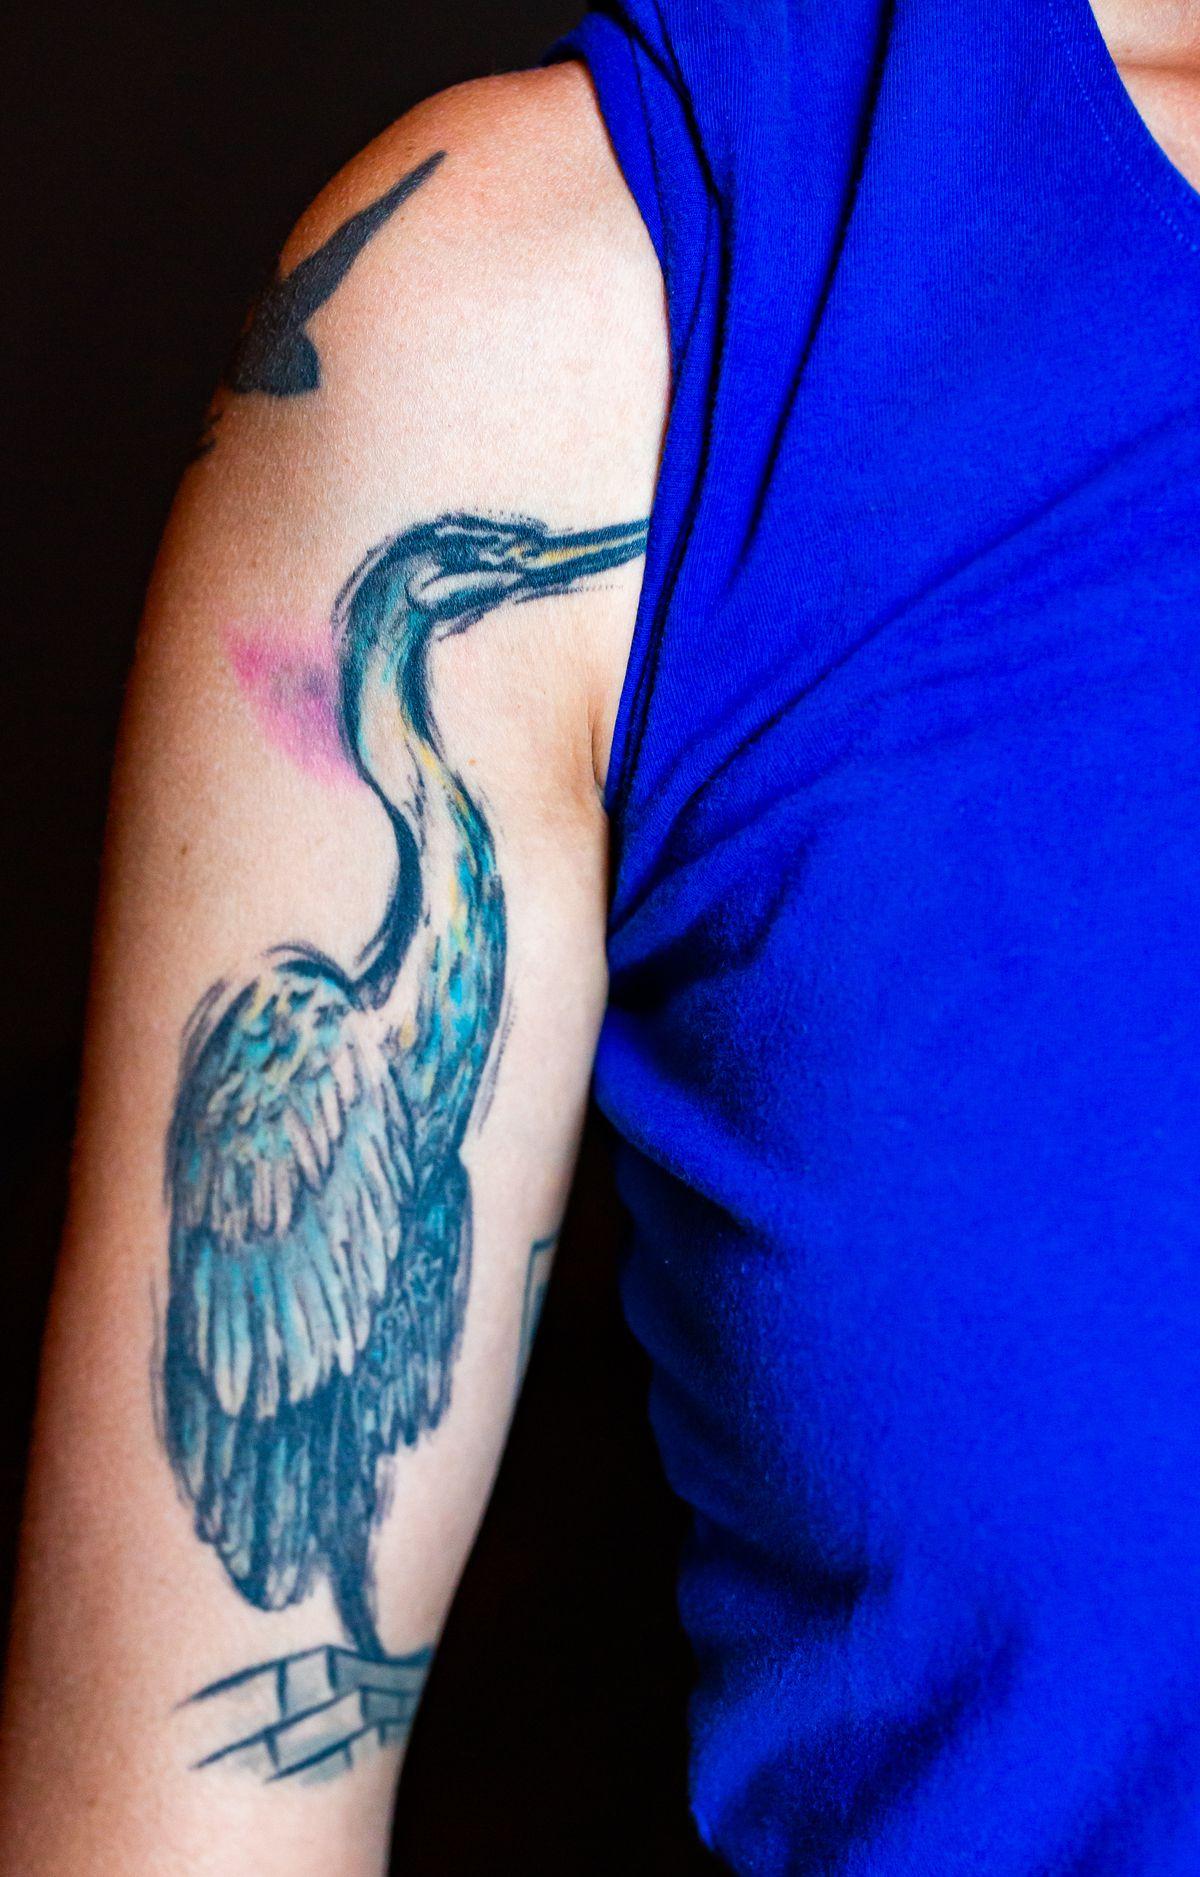 Jen Hidinger-Kendrick's right arm with a crane tattoo